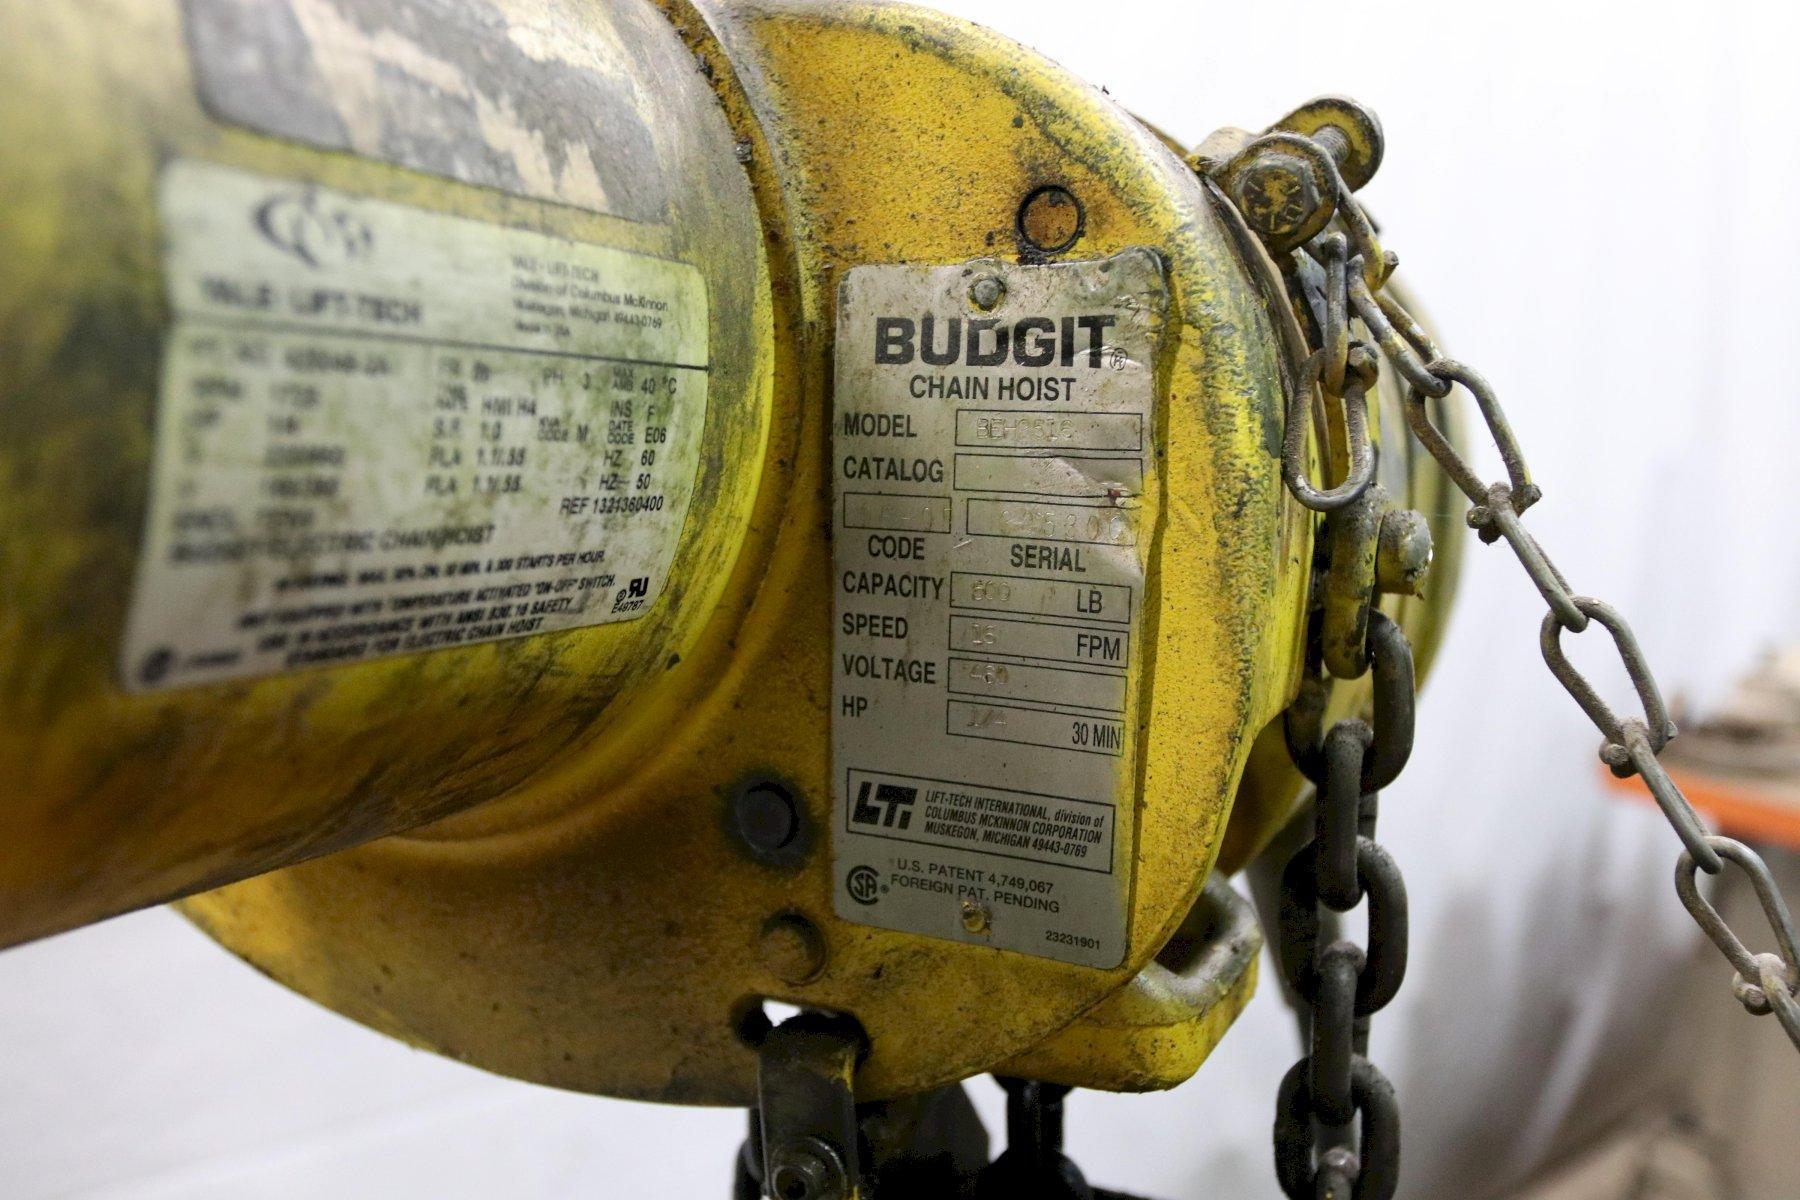 500 LB BUDGIT ELECTRIC POWERED CHAIN HOIST: STOCK #11977